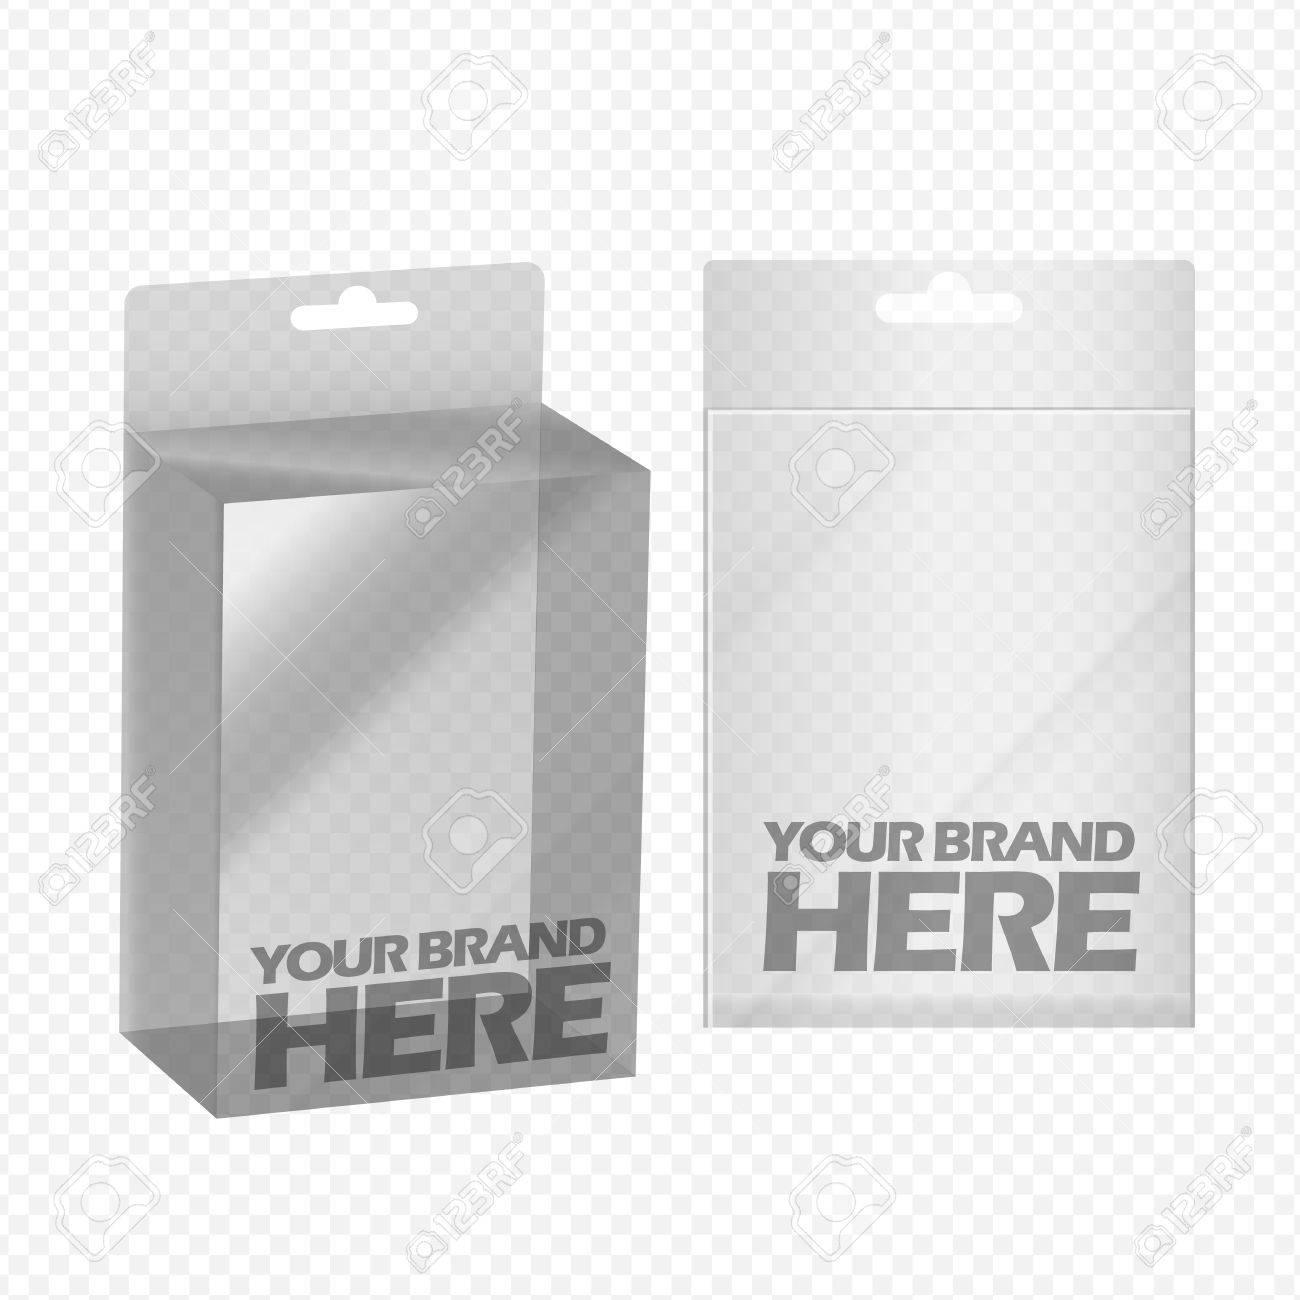 Digital Vector Silver Transparent Plastic Blank Box Mockup Ready